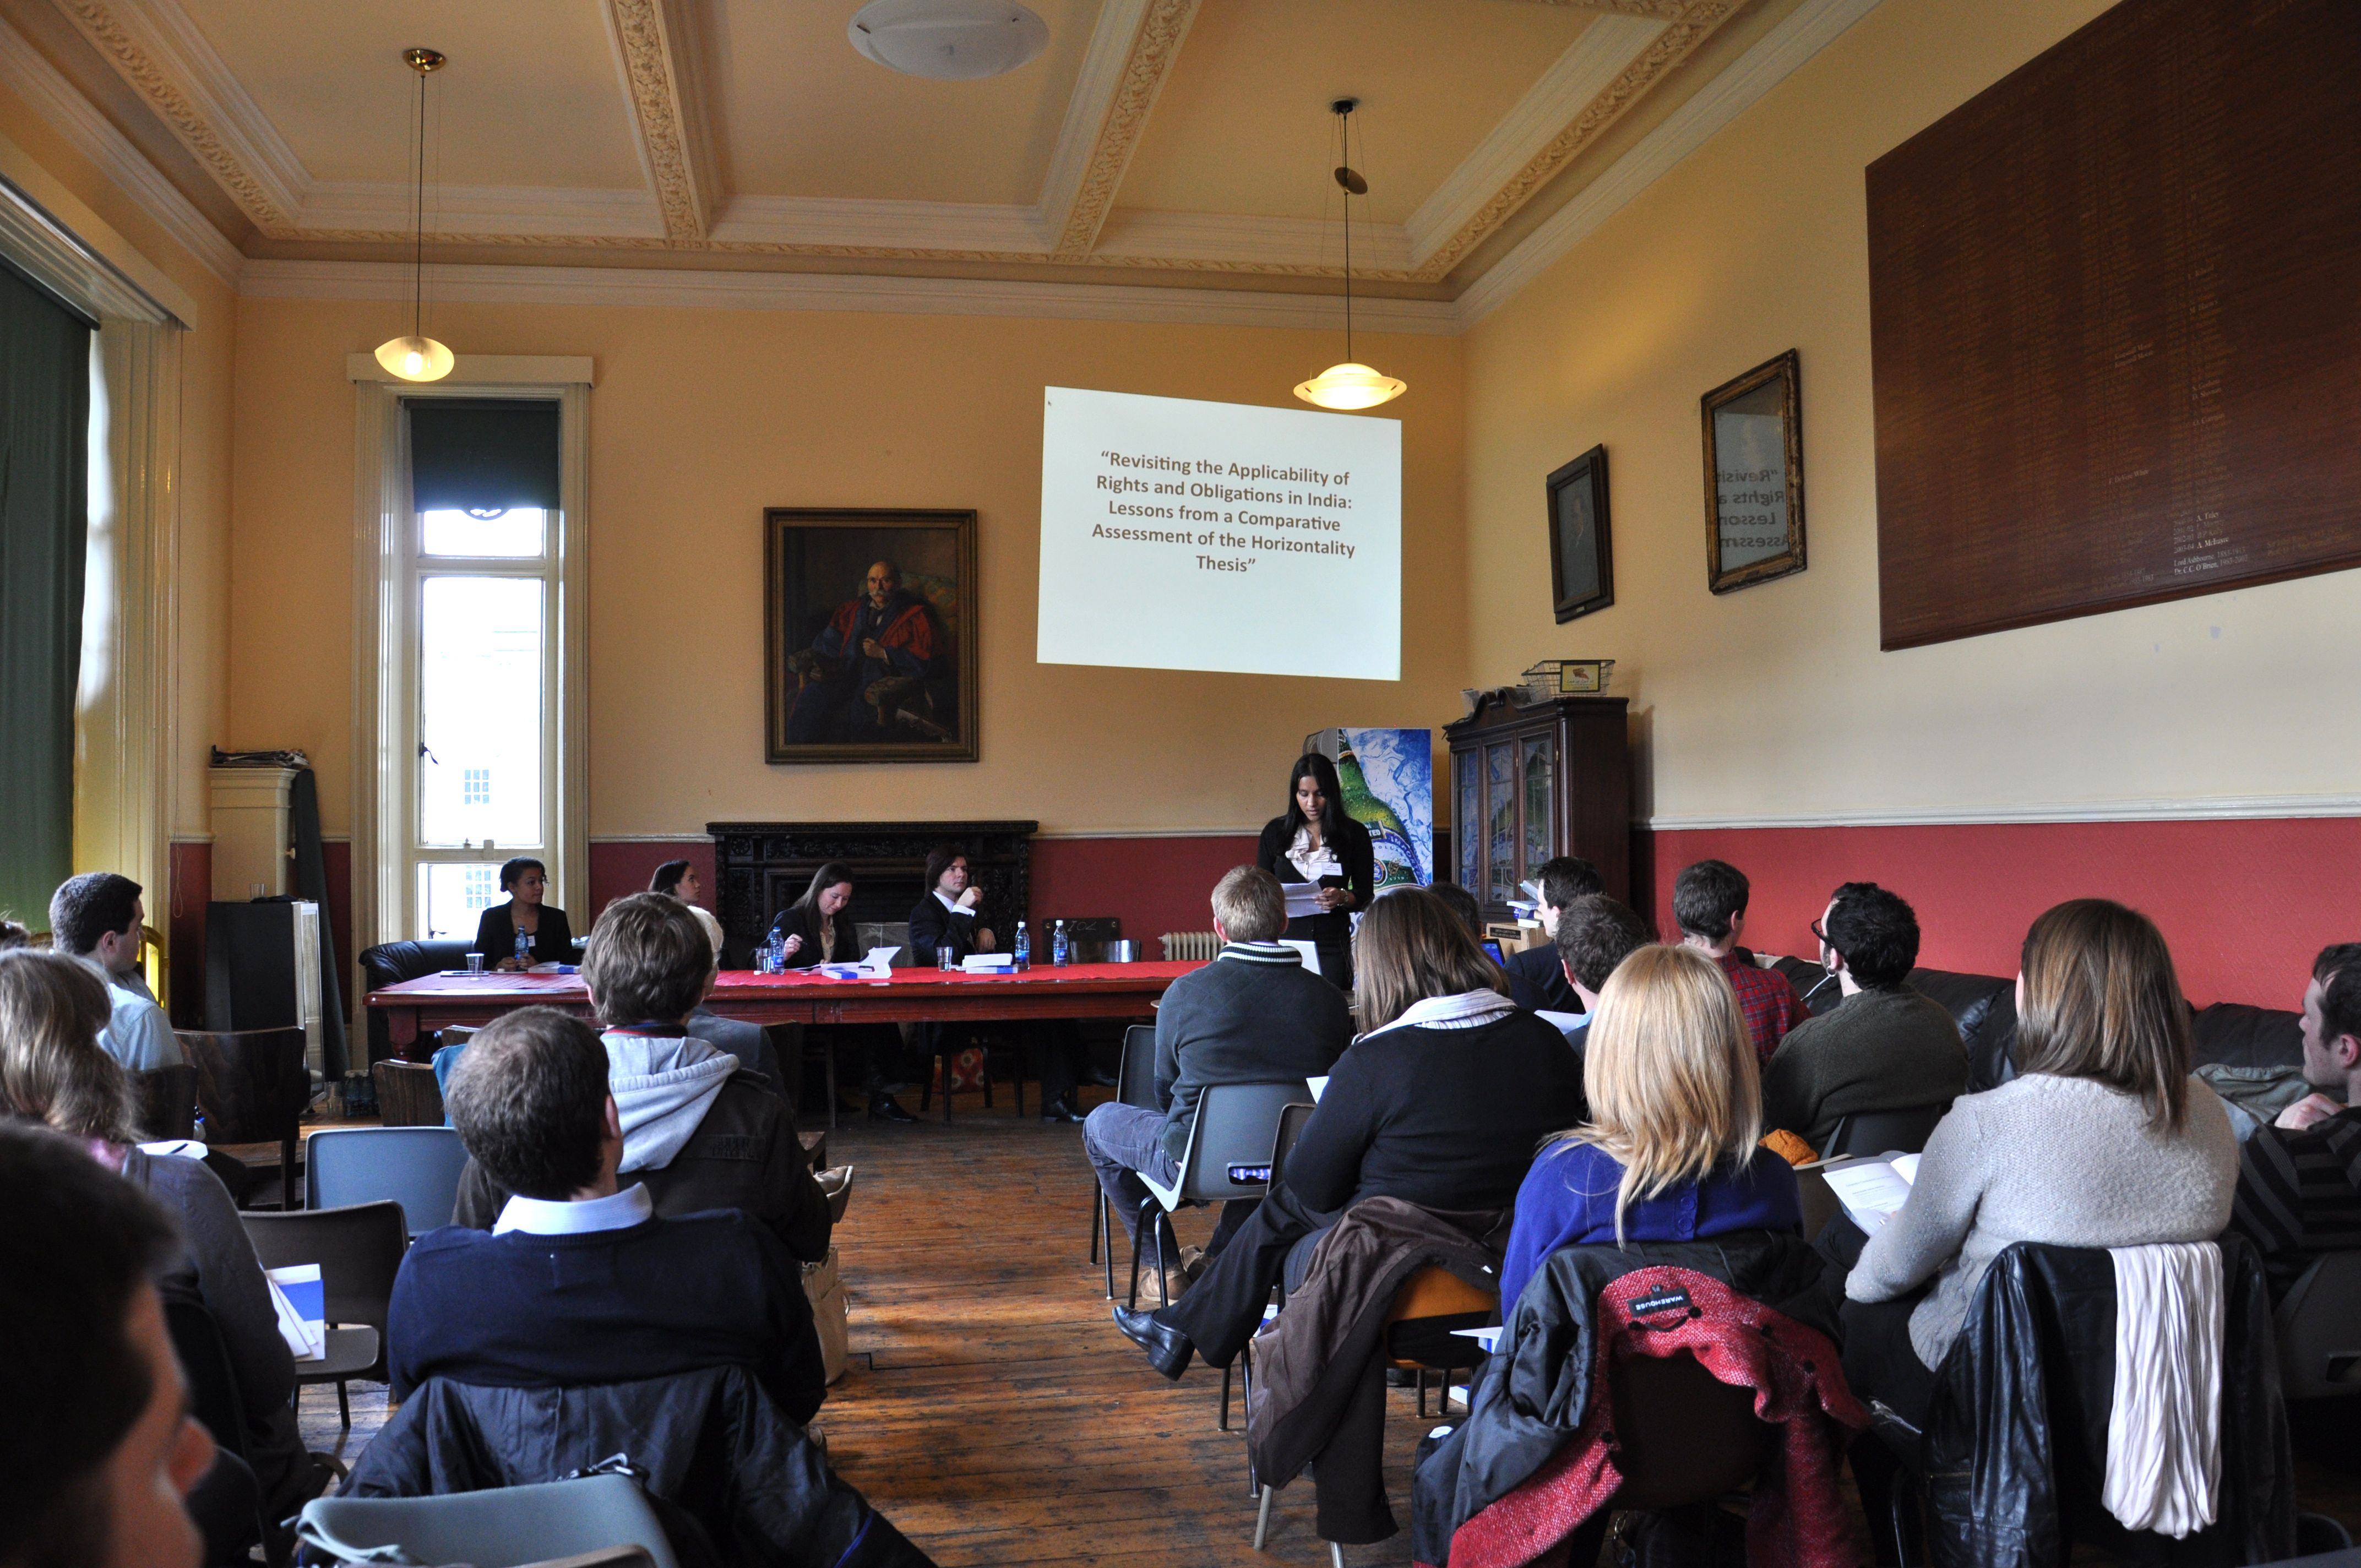 dissertation law proposal Dissertation Payant Dissertation Proposal Service Law  Dissertation Payant Dissertation  Proposal Service Law